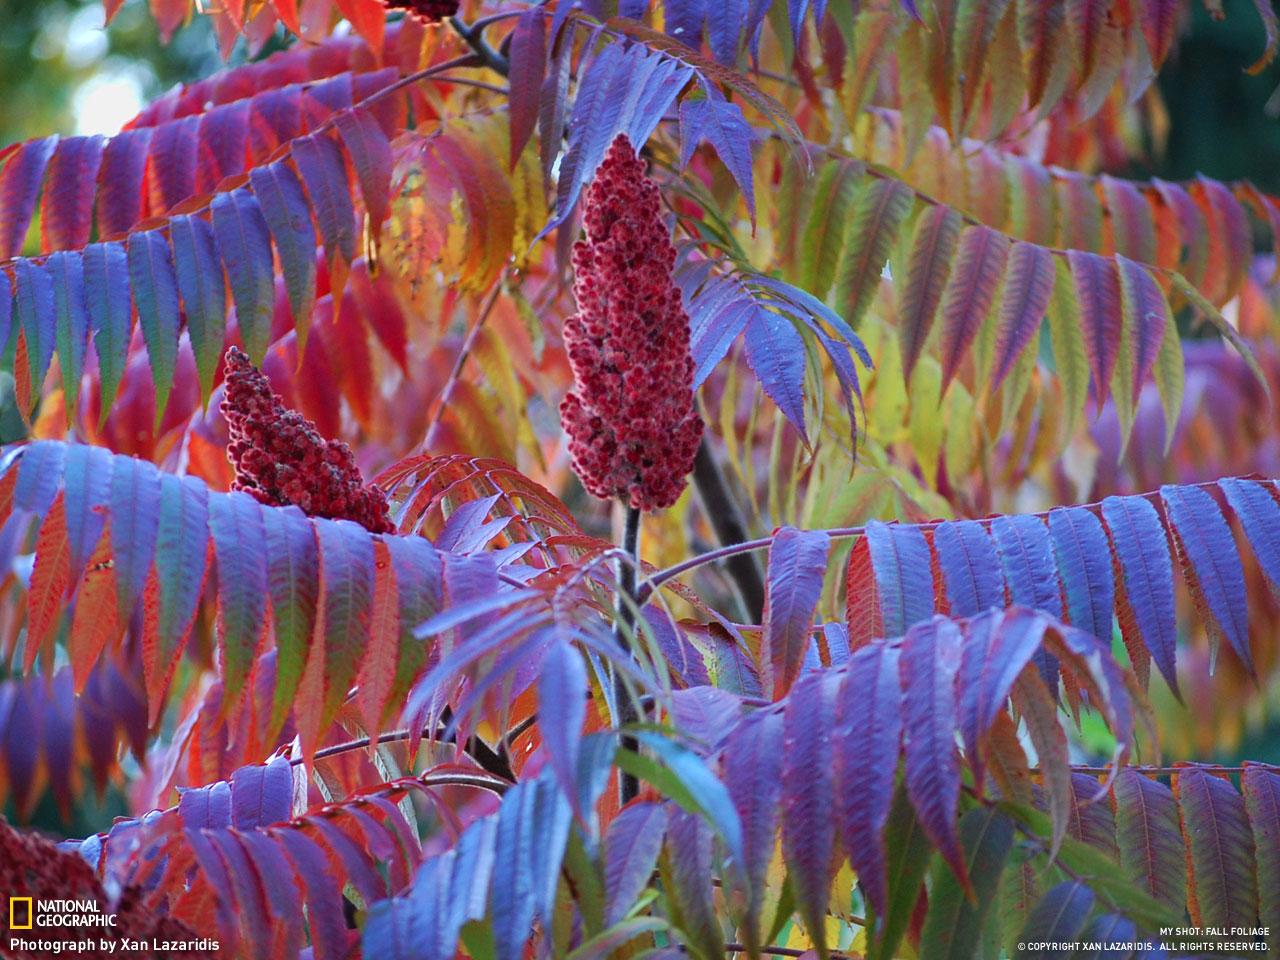 Осень от National Geographic